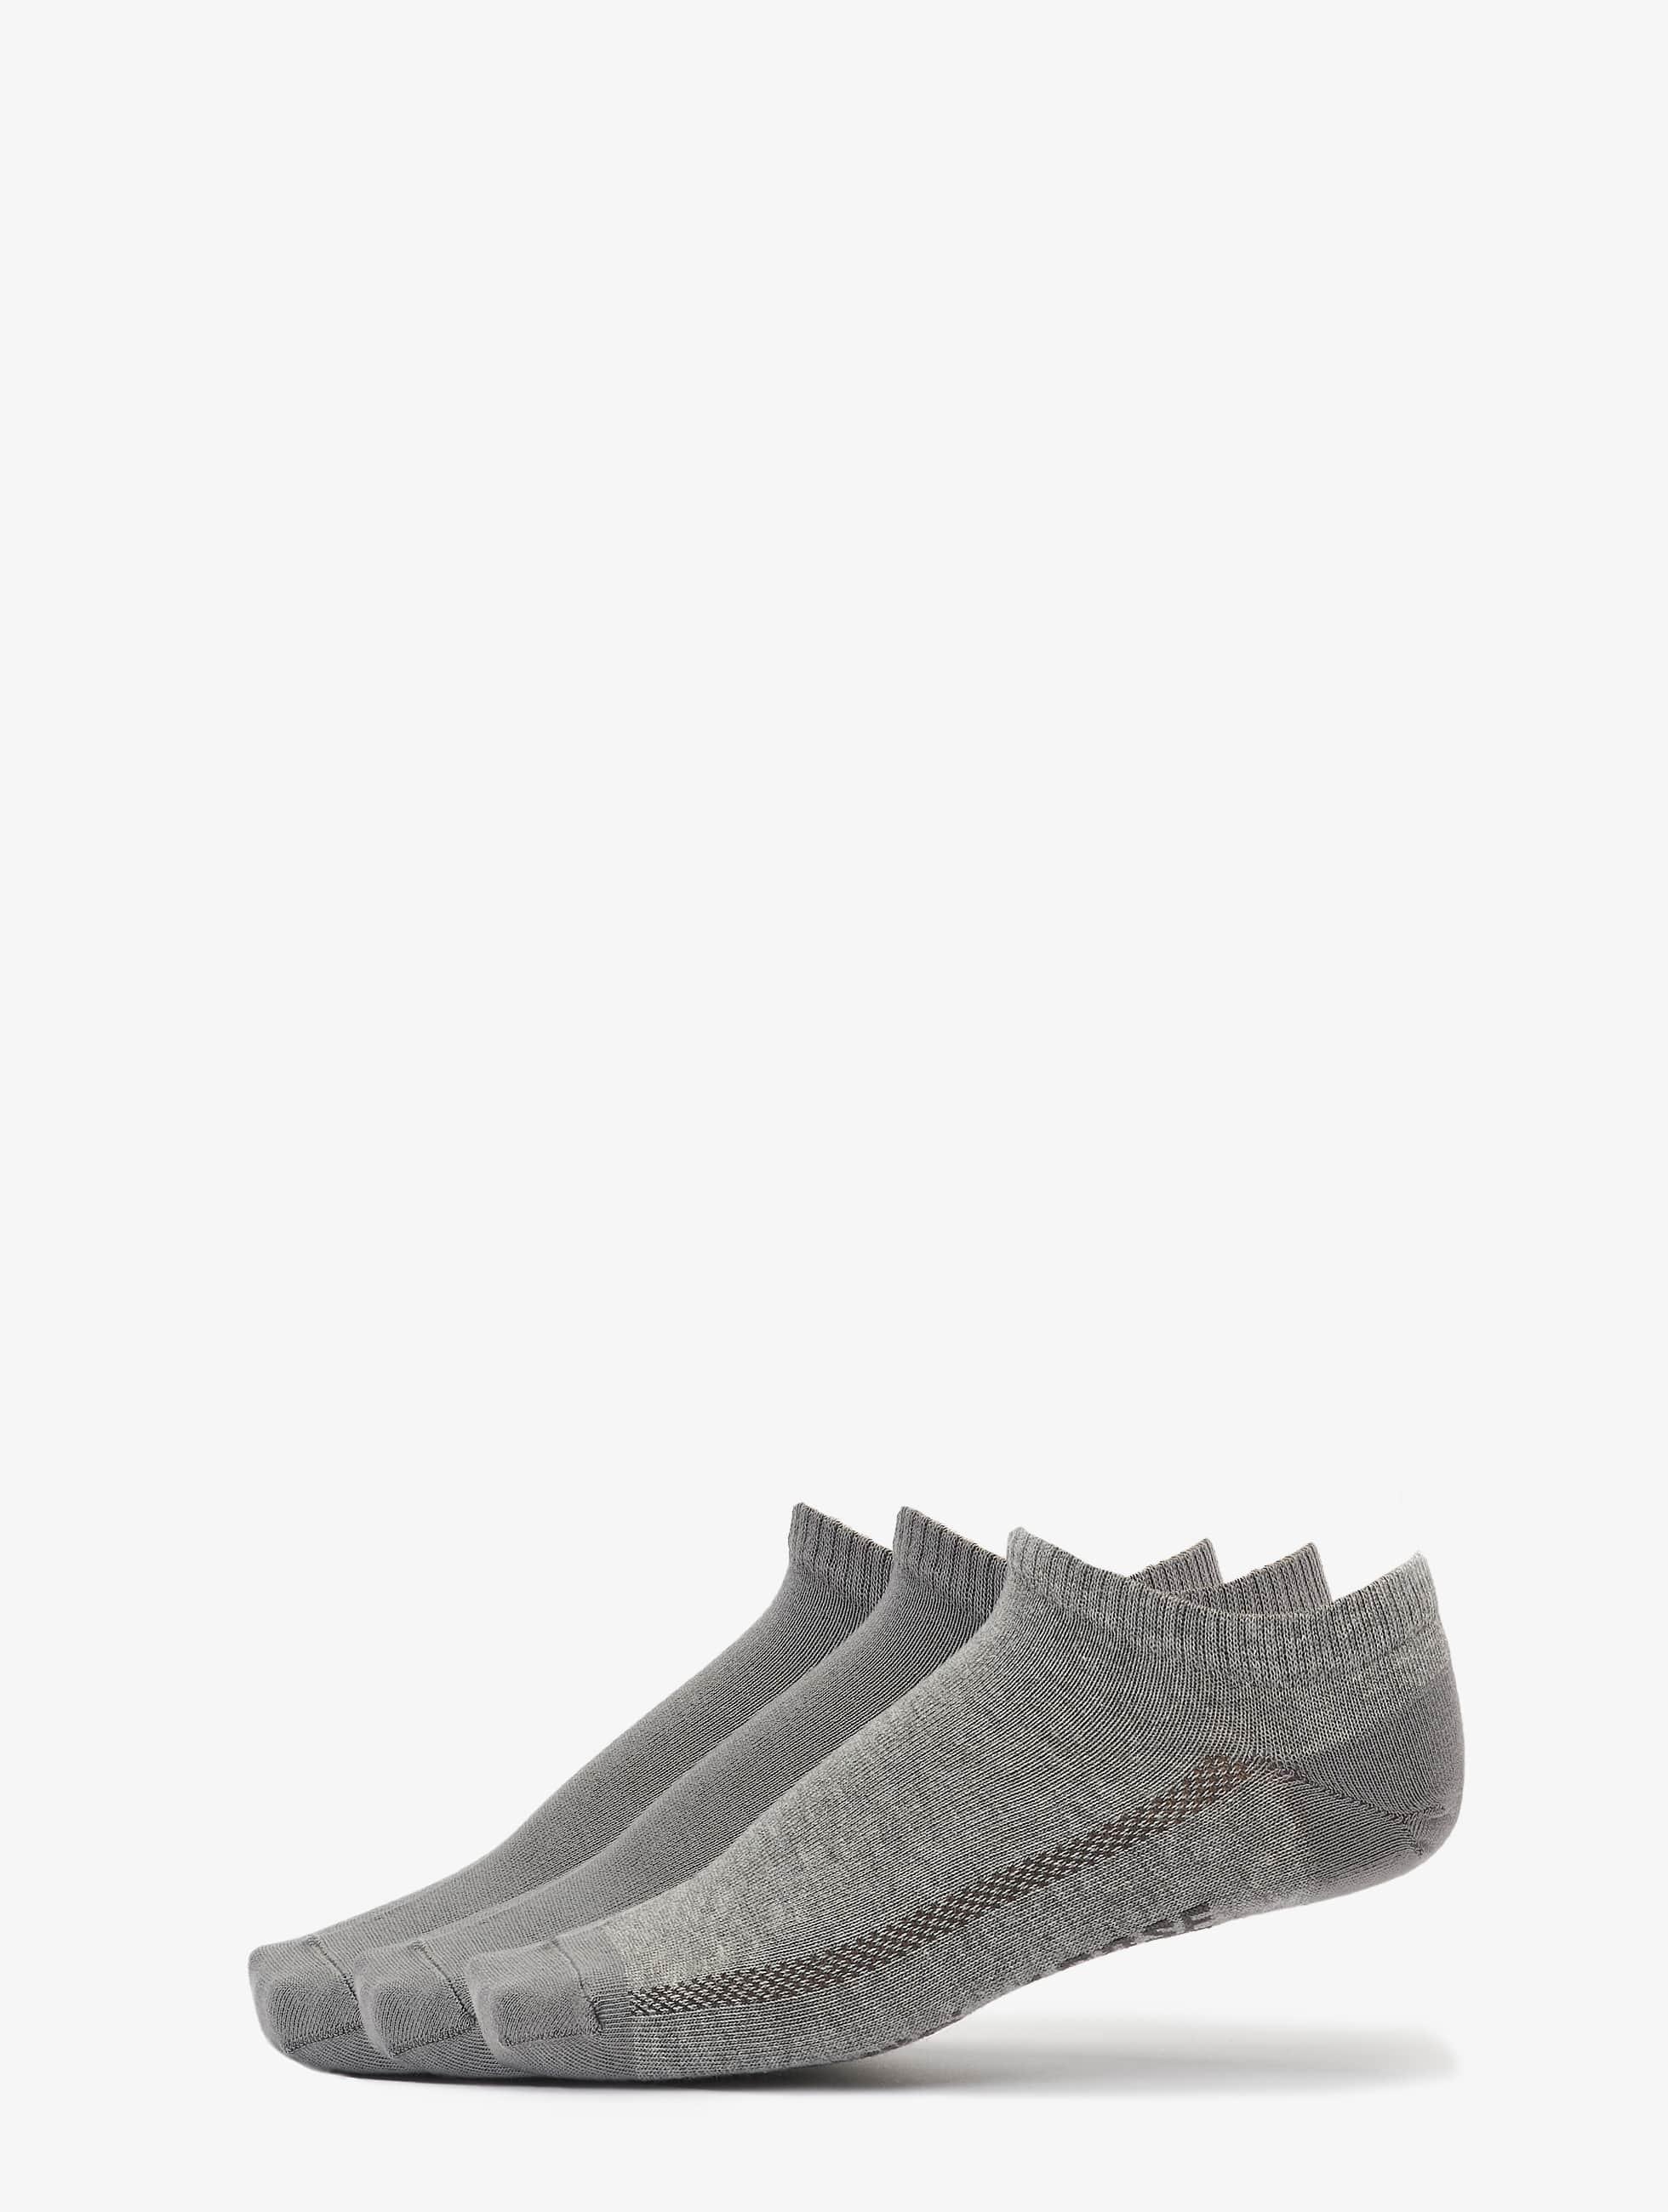 Levi's® Socks Low Cut gray